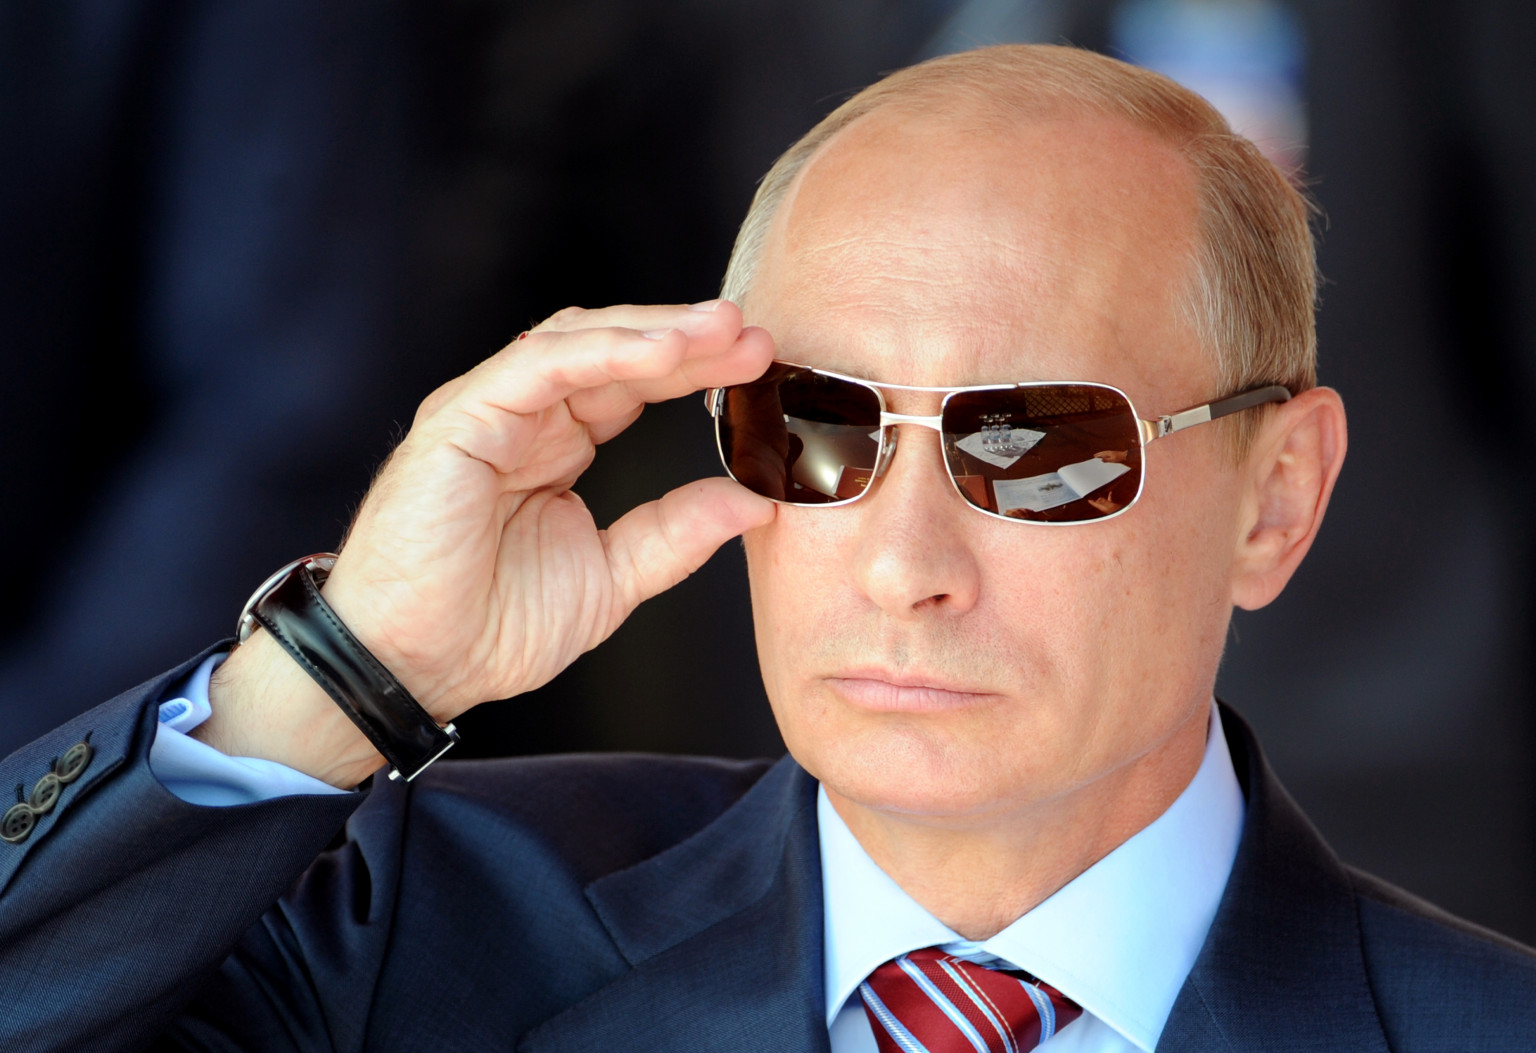 Фотографии Владимира Путина 148 фото  Триникси